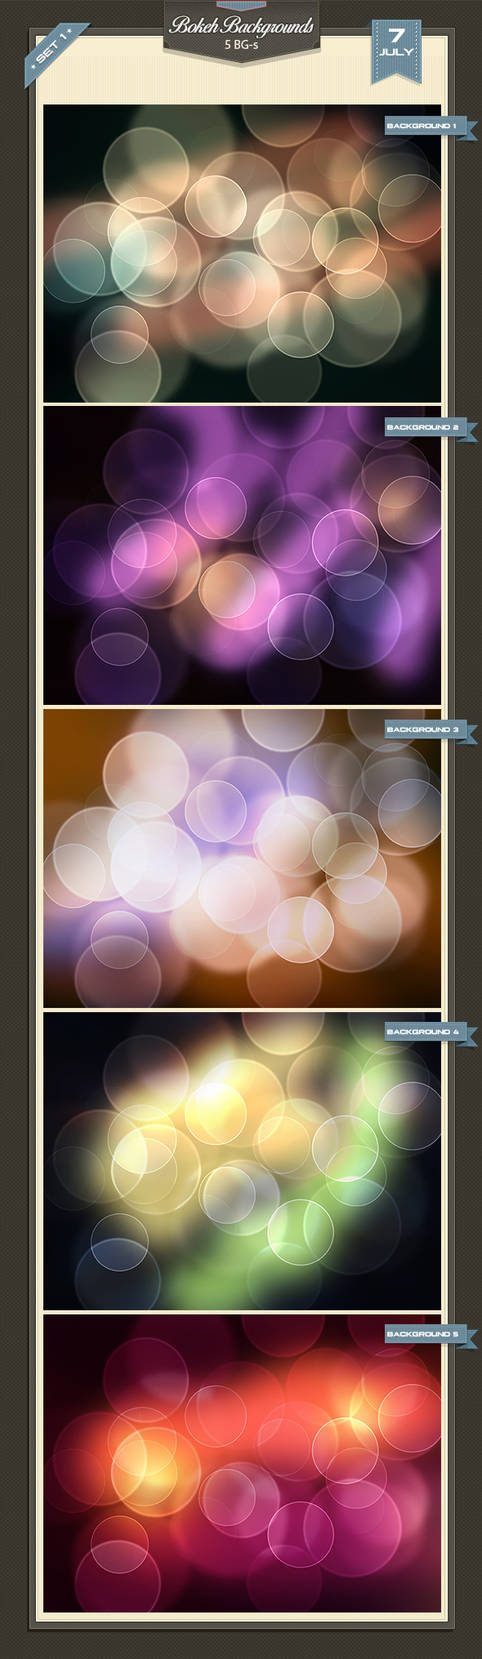 Bokeh Backgrounds 1